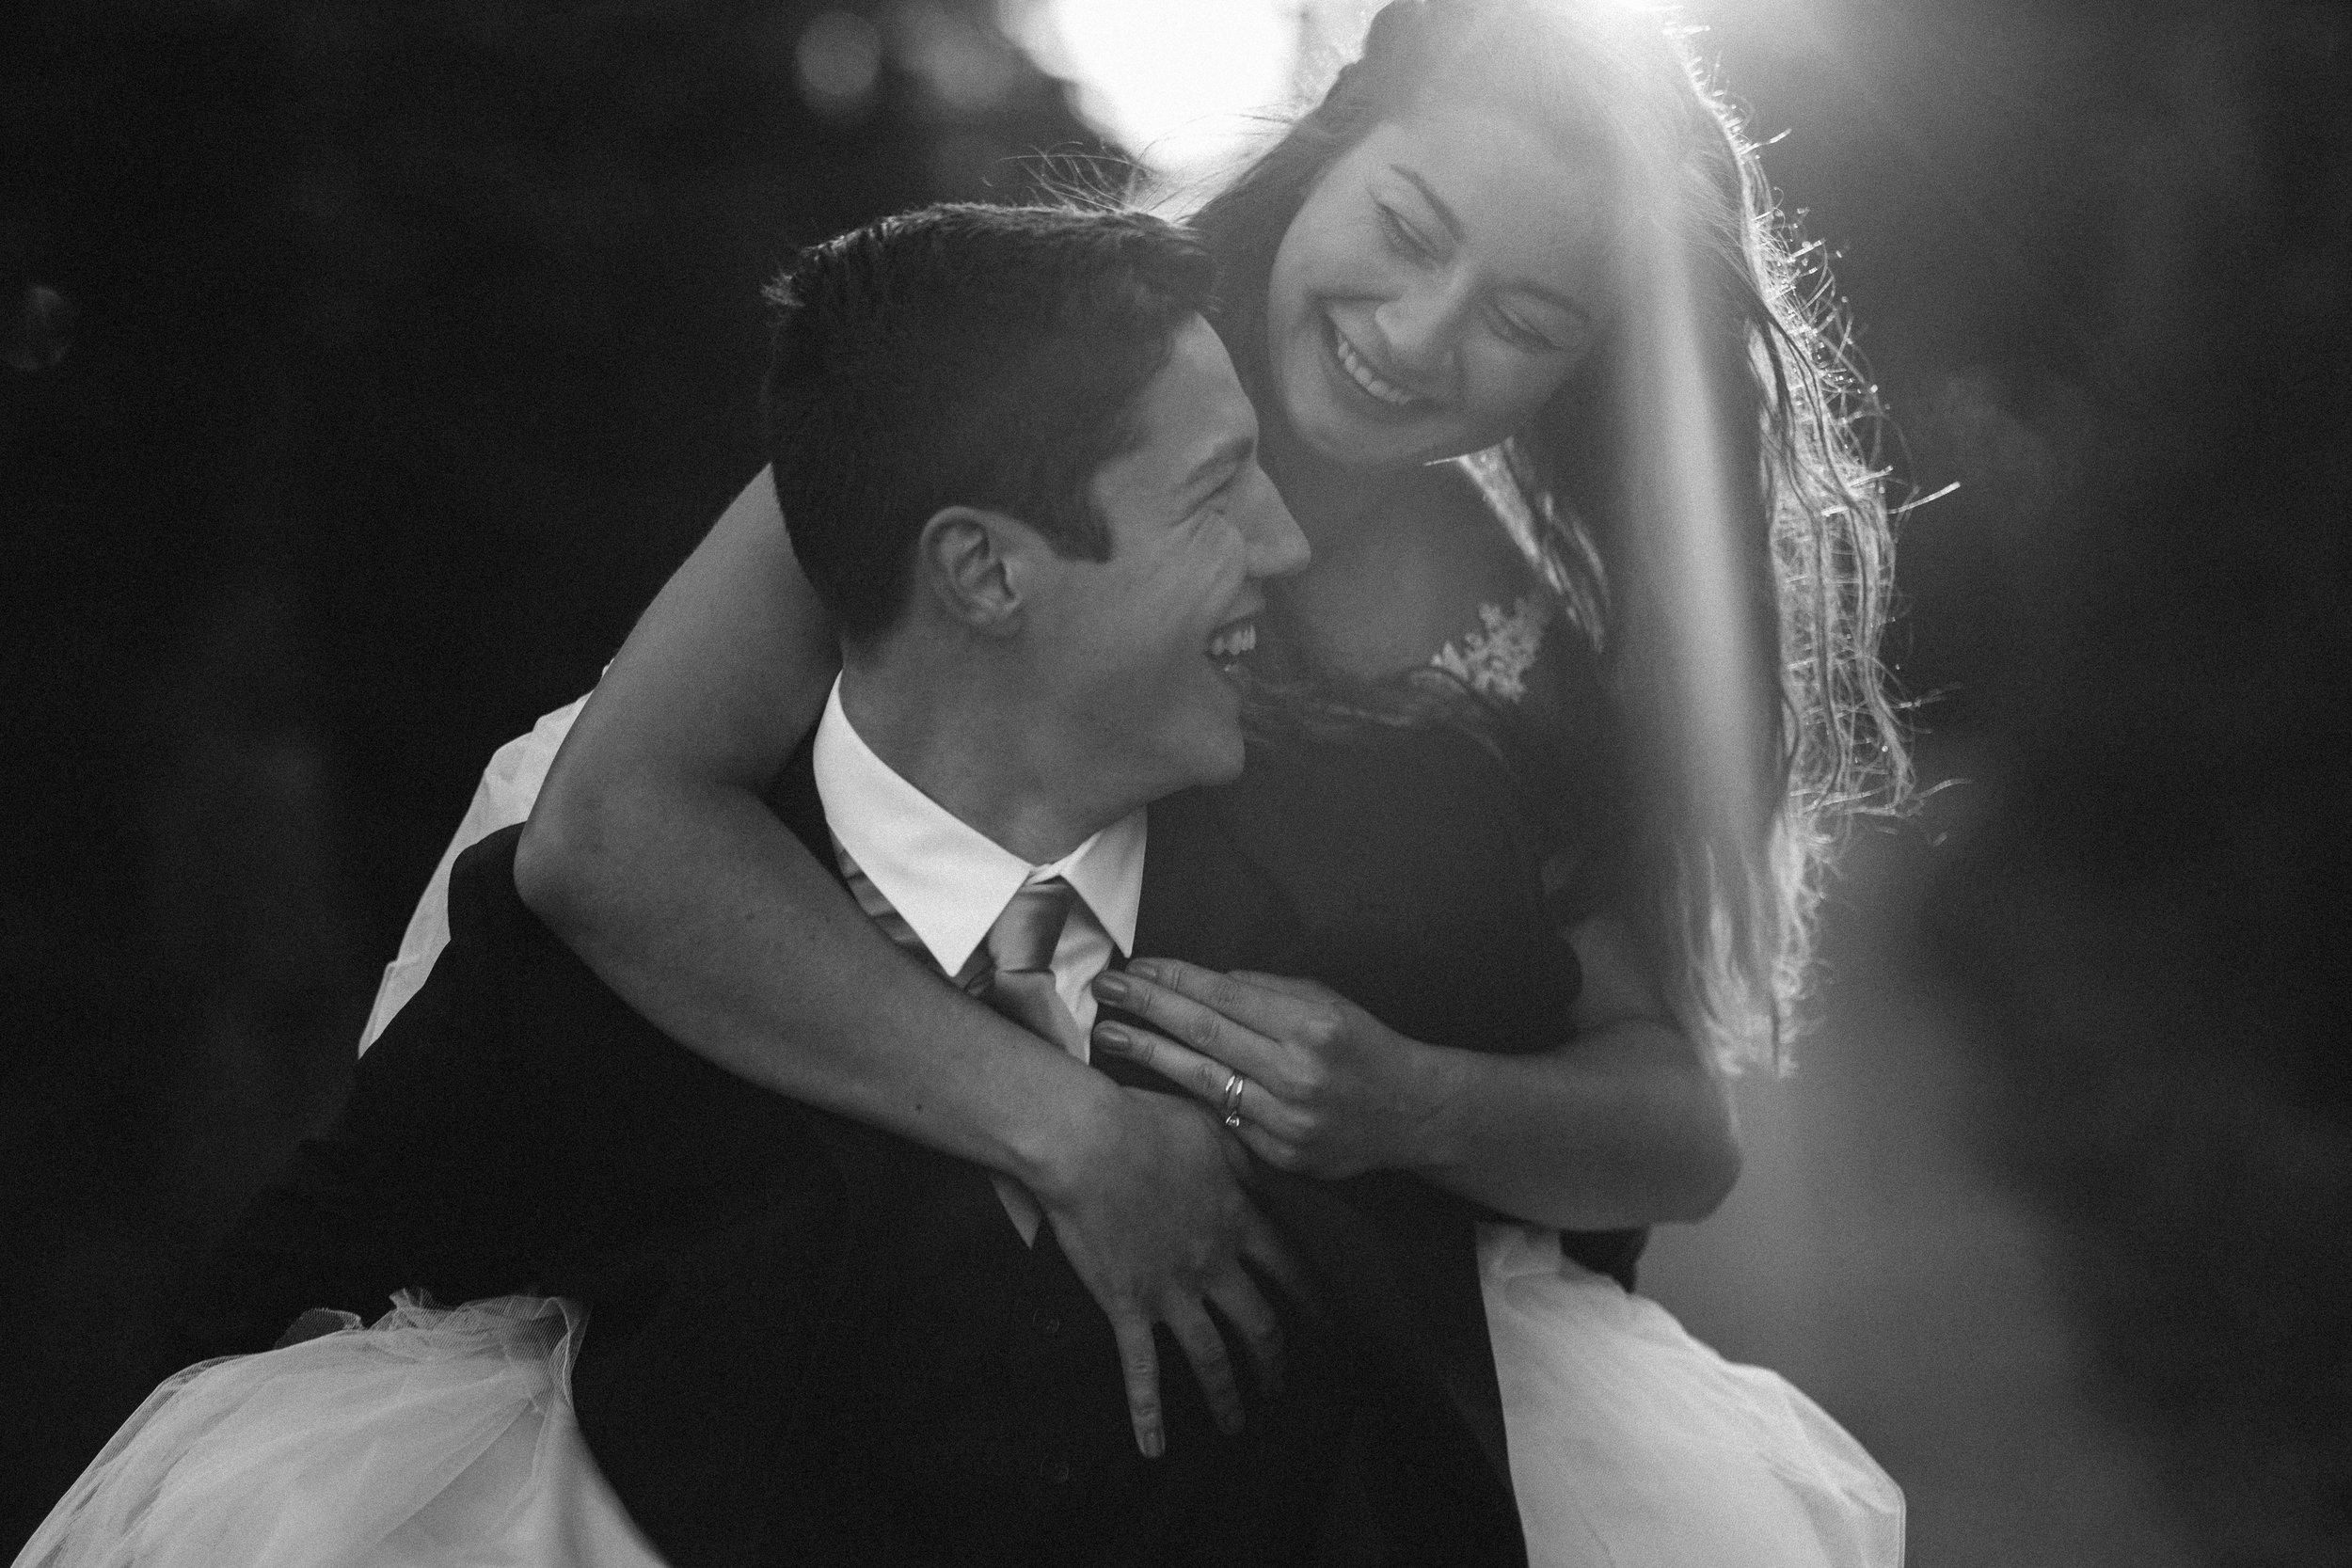 Nicole-Daacke-Photography-Mt-Rainier-elopement-photographer-washington-mountain-epic-wedding-photography-wildflowers-at-rainier-pine-tree-cloudy-summer-day-at-mountain-rainier-31.jpg